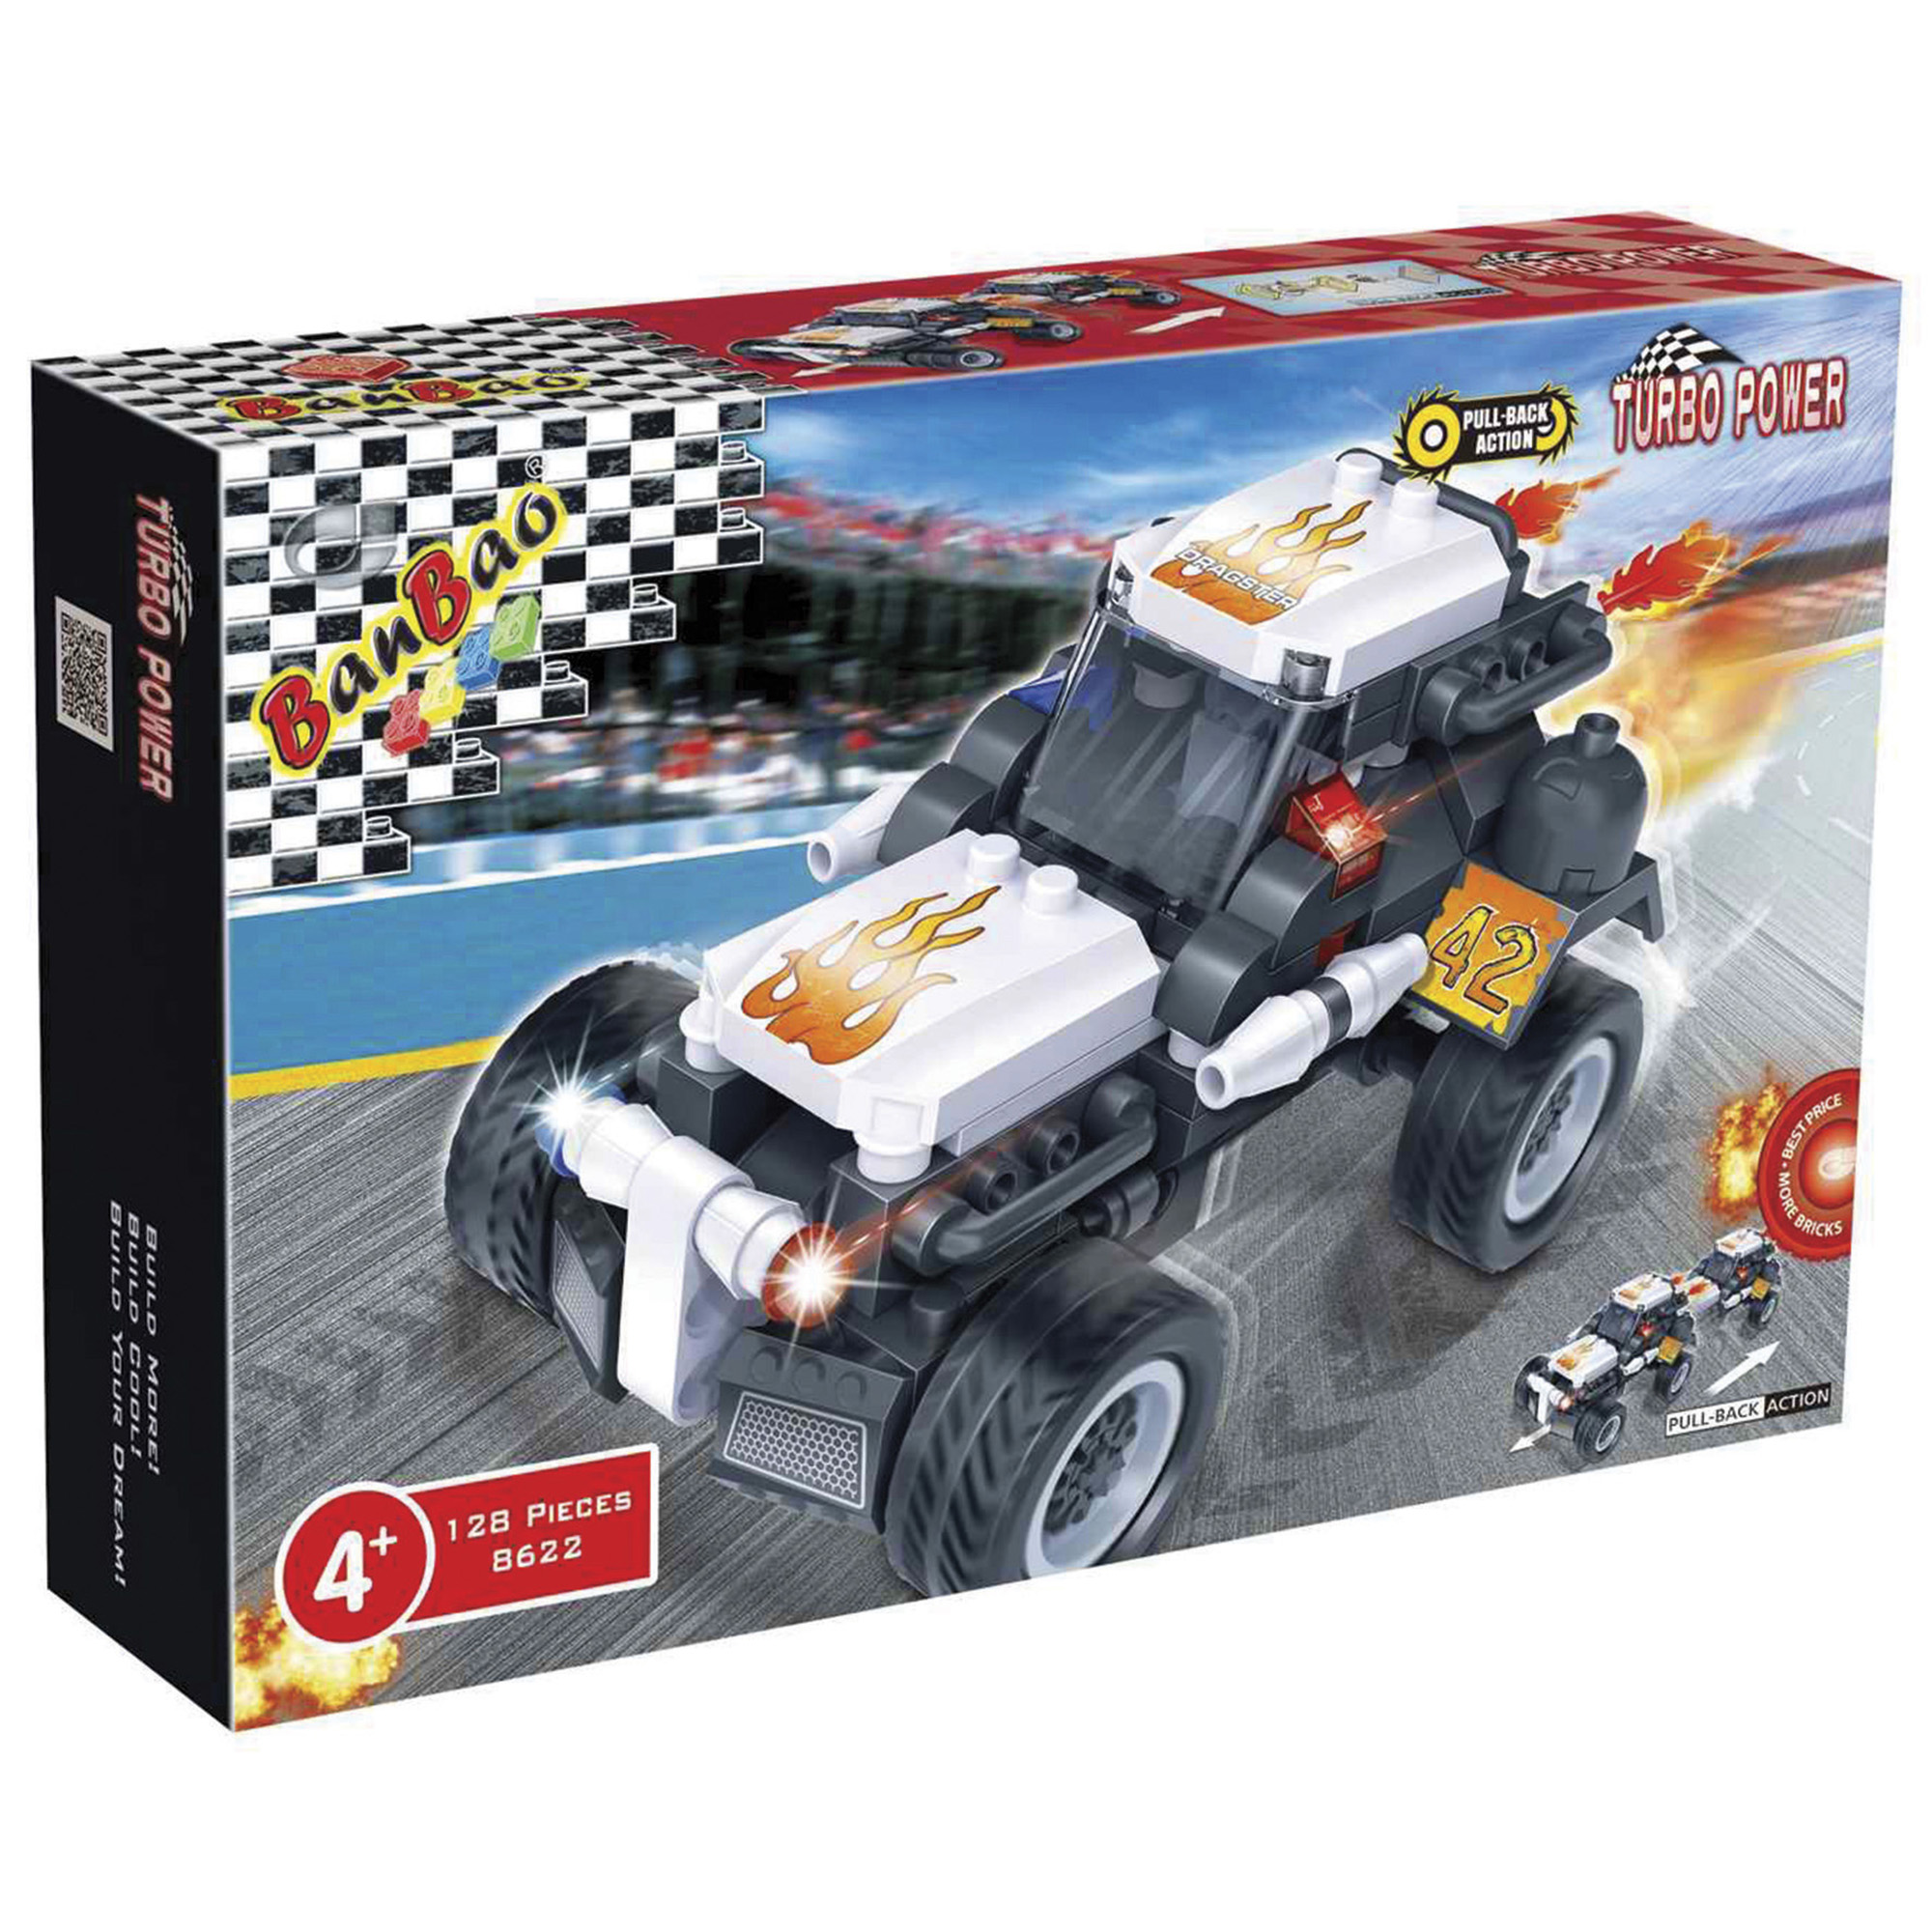 jeux de soci t turbo power camion dragster blanc enfants ditions gladius. Black Bedroom Furniture Sets. Home Design Ideas